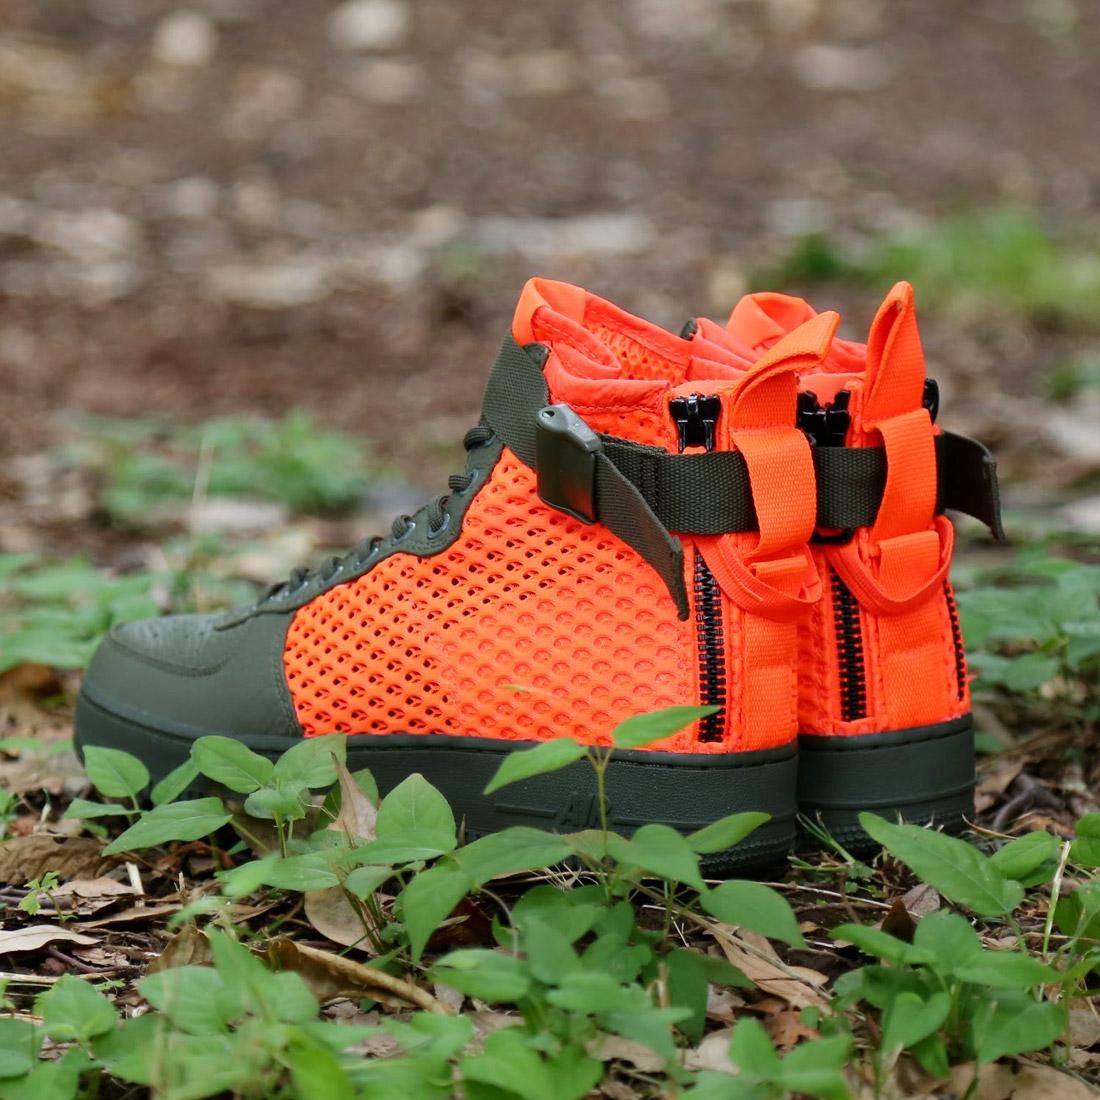 99add8346e70 NIKE SF AF1 MID QS (Nike special field air force 1 mid QS) (CARGO KHAKI TOTAL  CRIMSON-CARGO KHAKI) 17FA-S